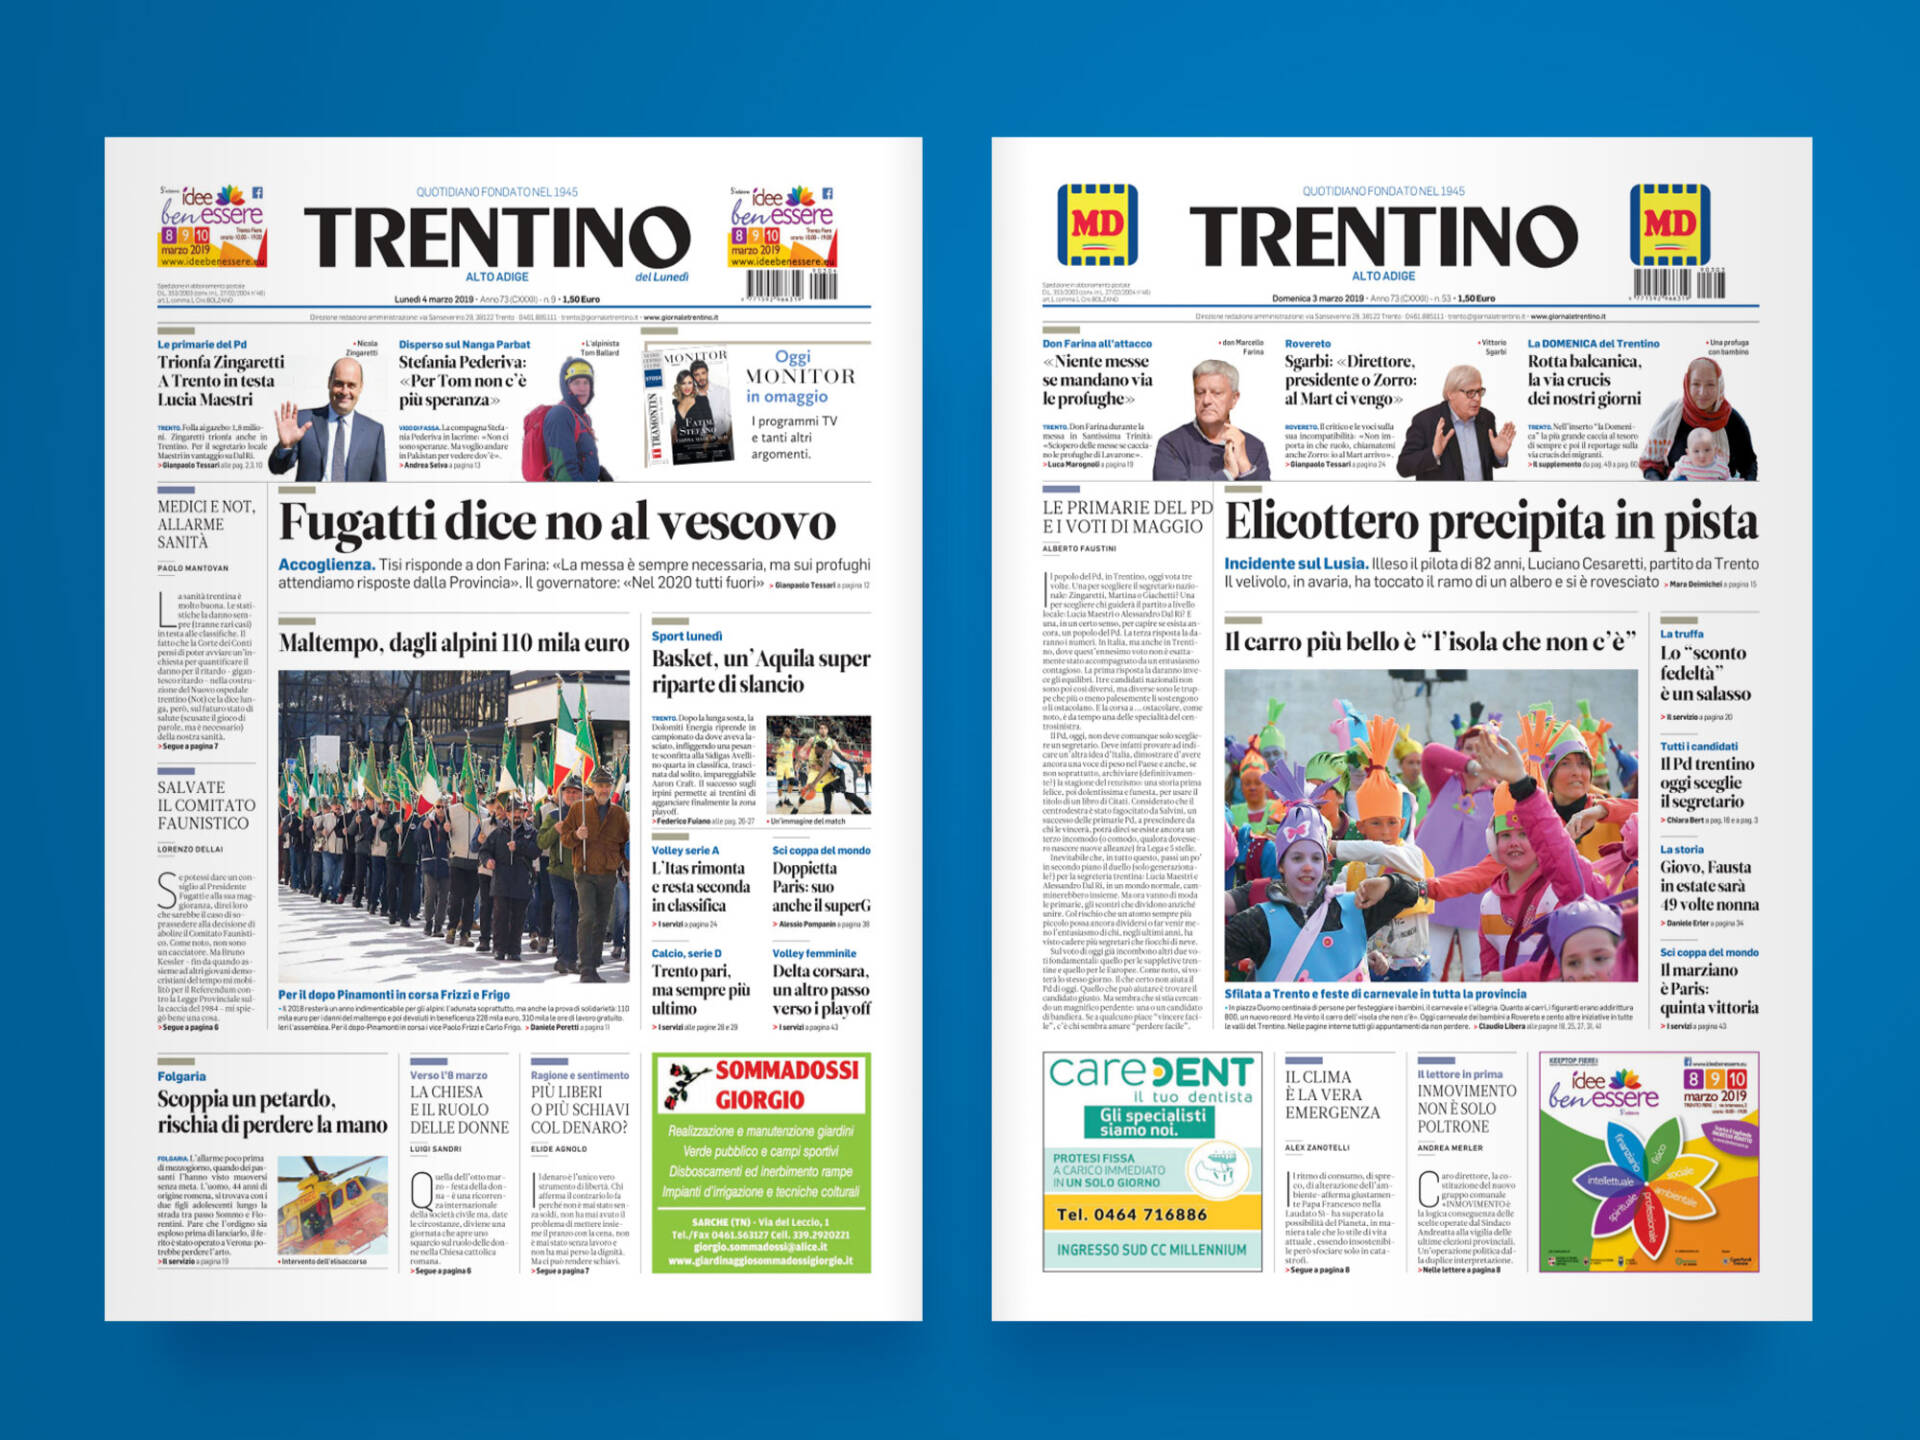 Trentino_09_Wenceslau_News_Design